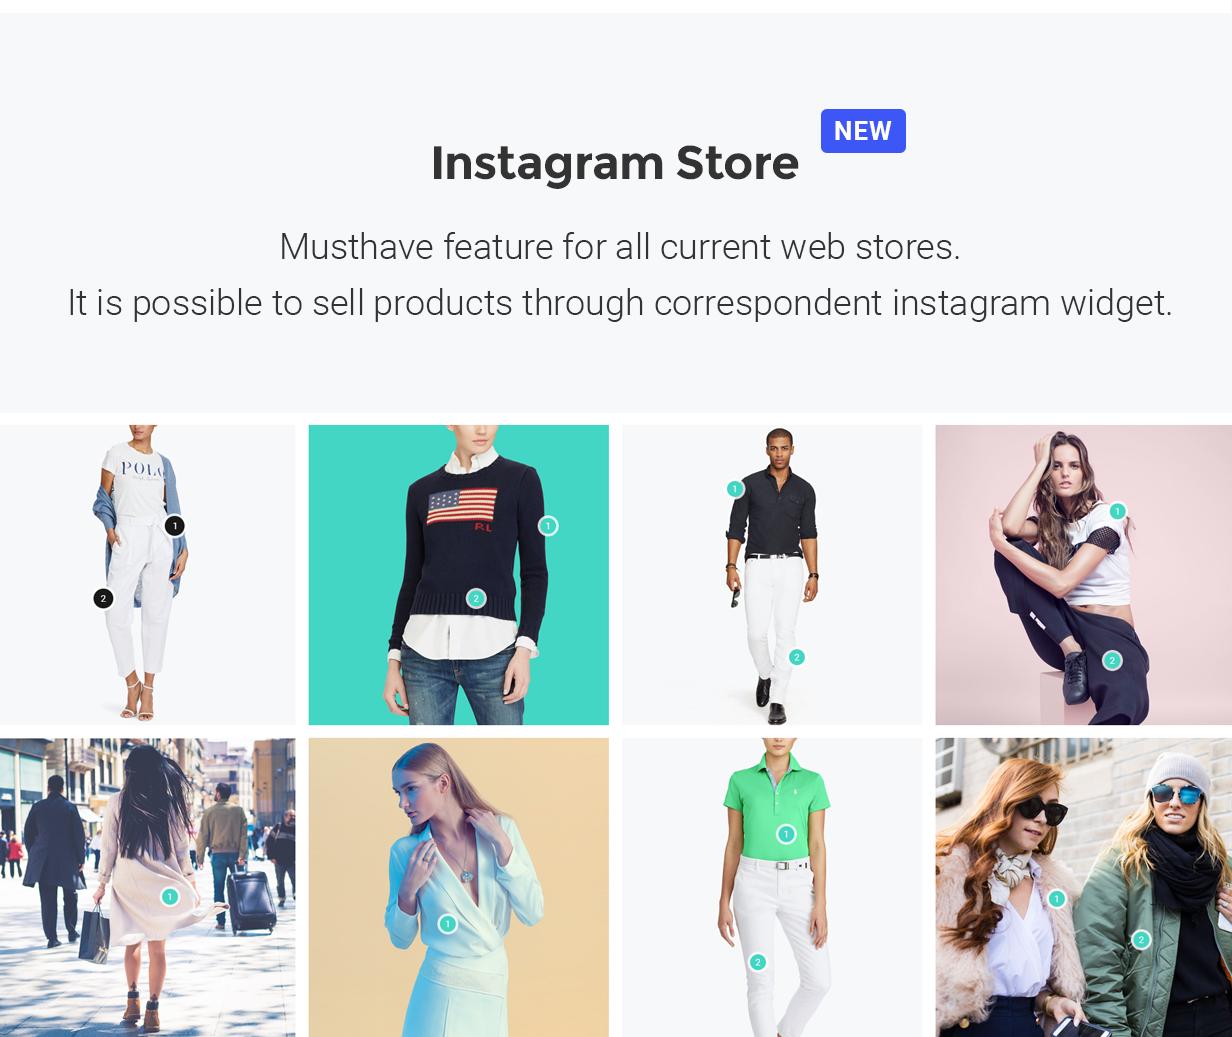 YourStore - Version3 - Instagram Store